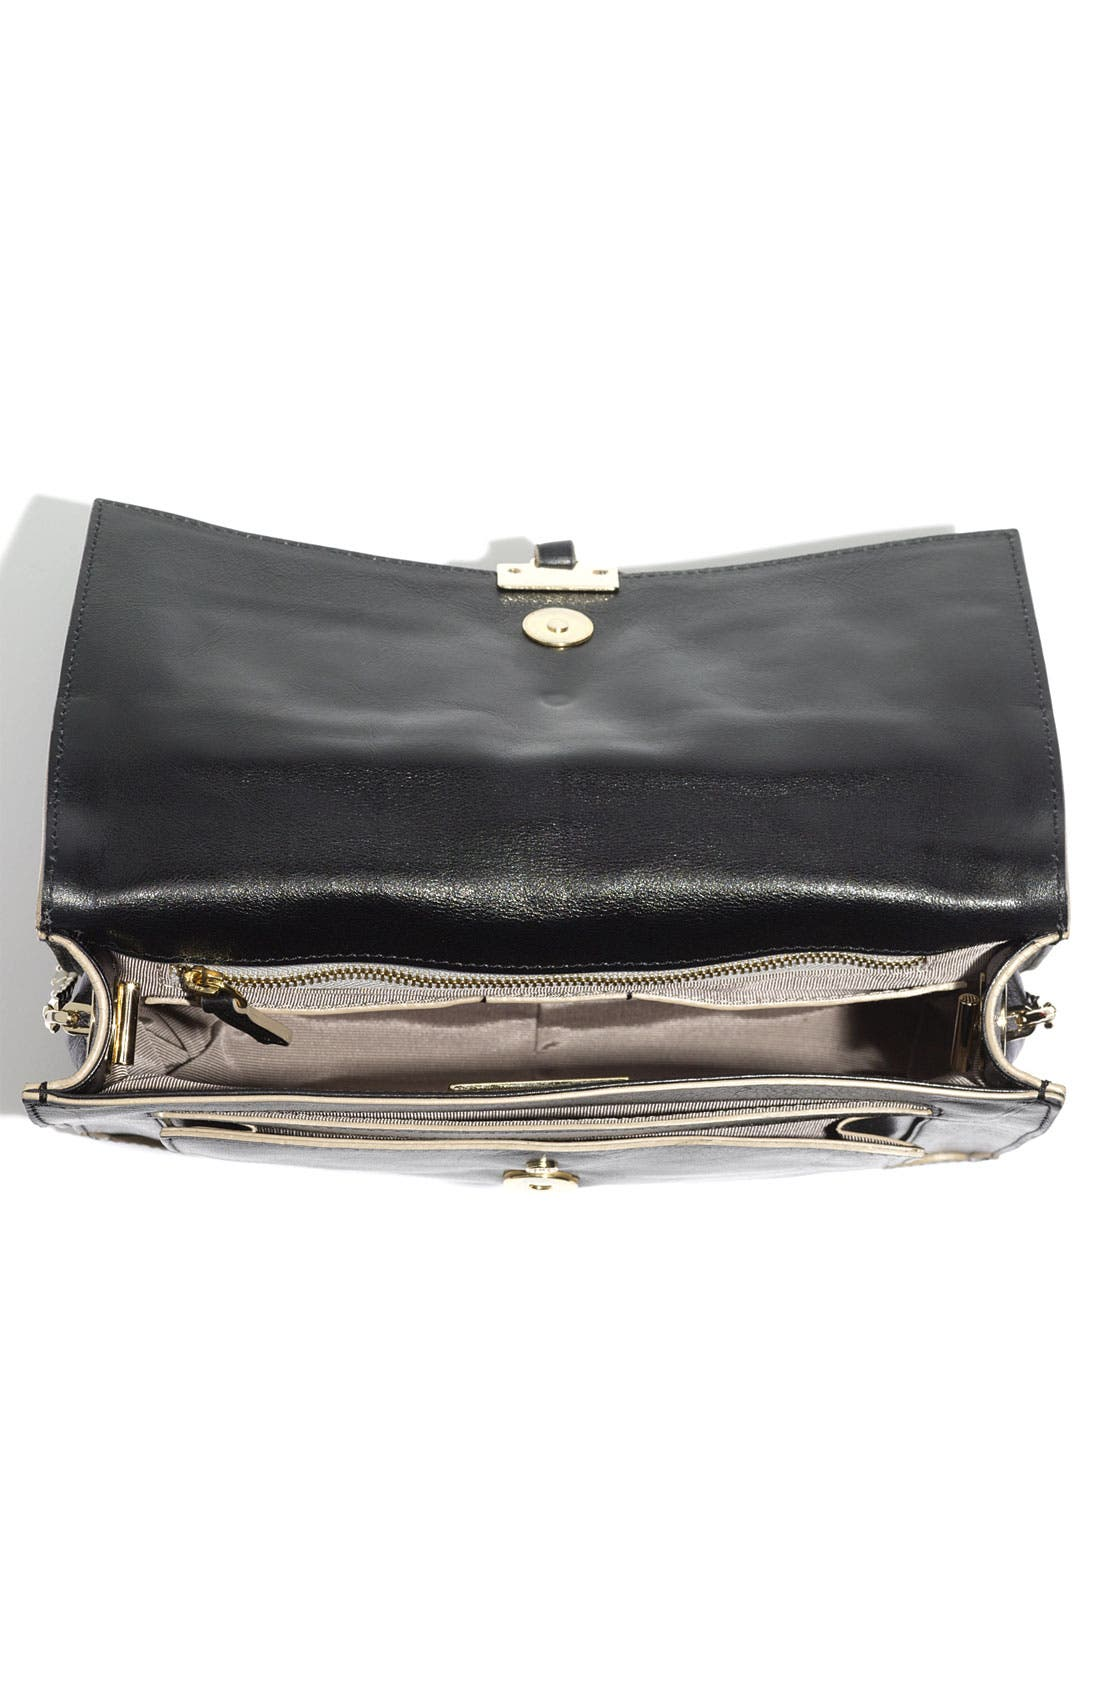 Alternate Image 3  - Jason Wu 'Jourdan' Calfskin Leather Shoulder Bag